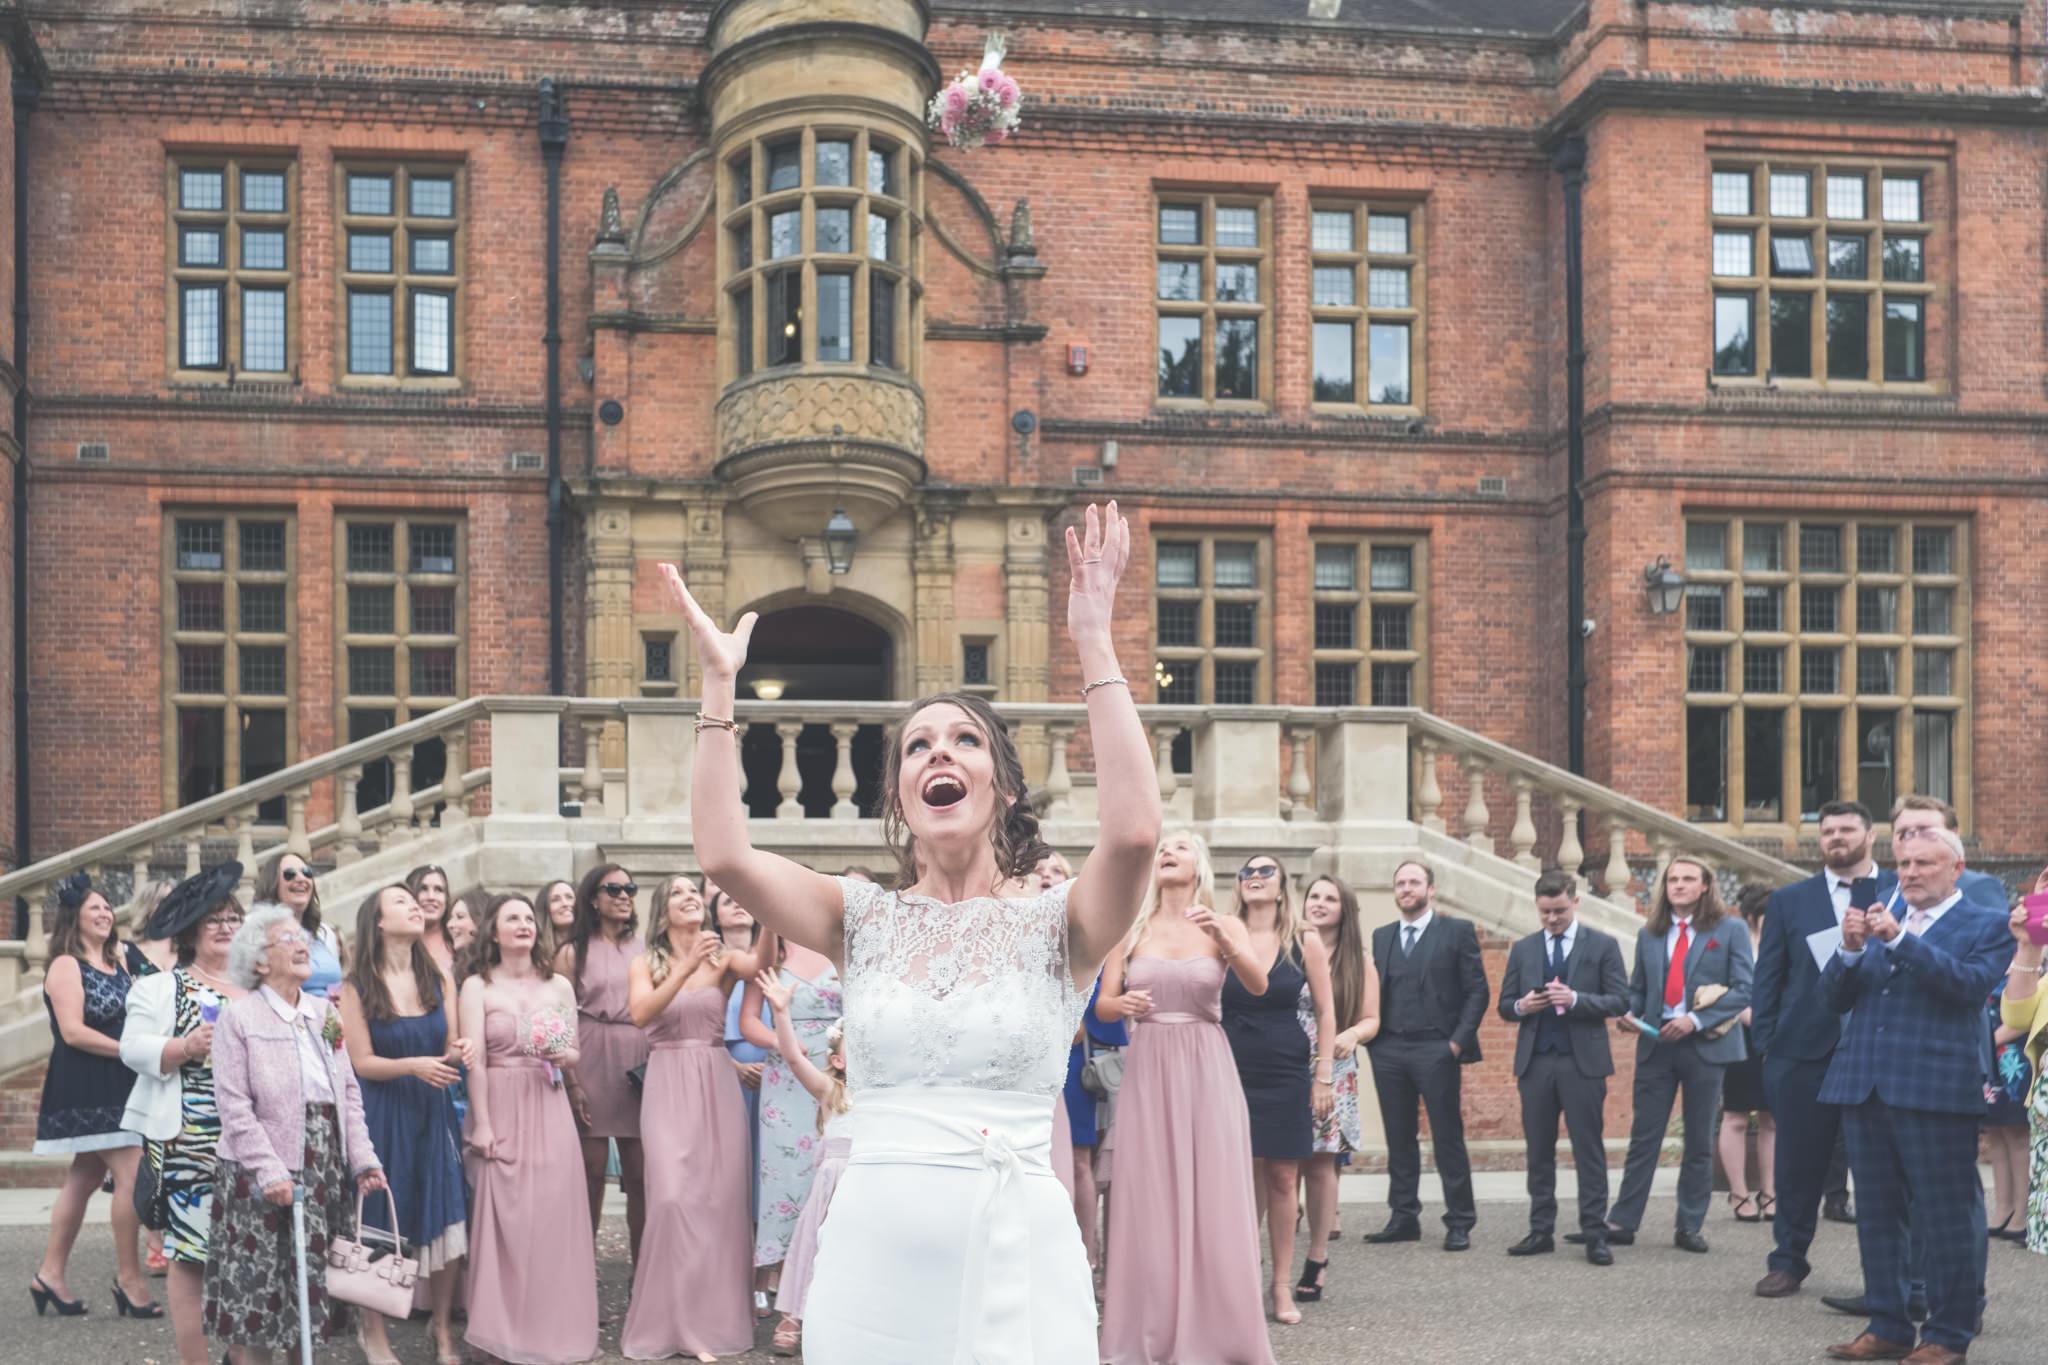 Woldingham School Wedding - Robin Ball Photography - Kate and Lee-021.jpg